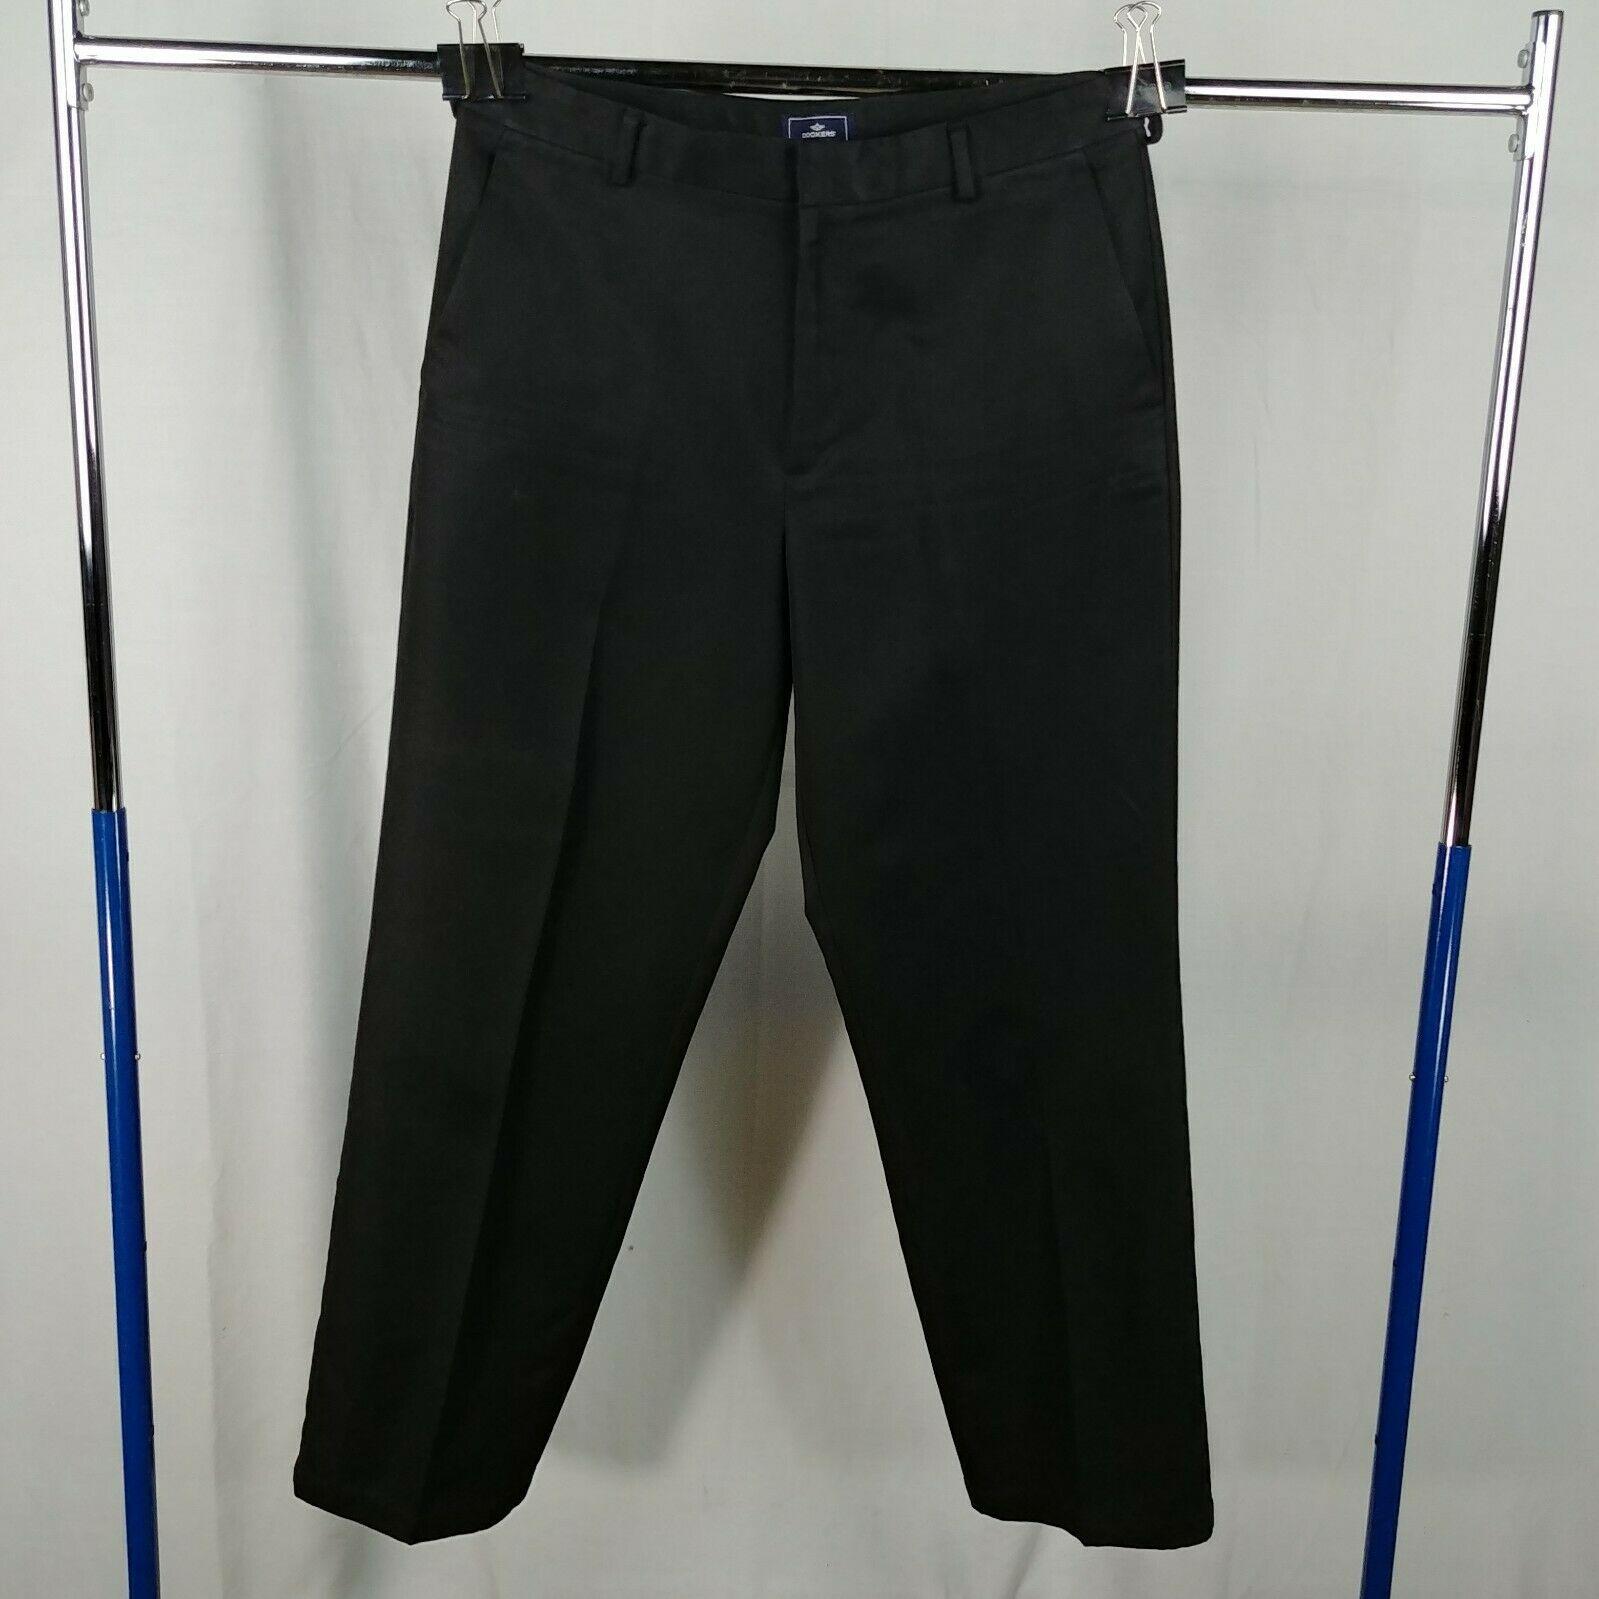 a8cc8259 Dockers Black Flat Front Casual Pants Mens Size 33 x 32 Straight Leg